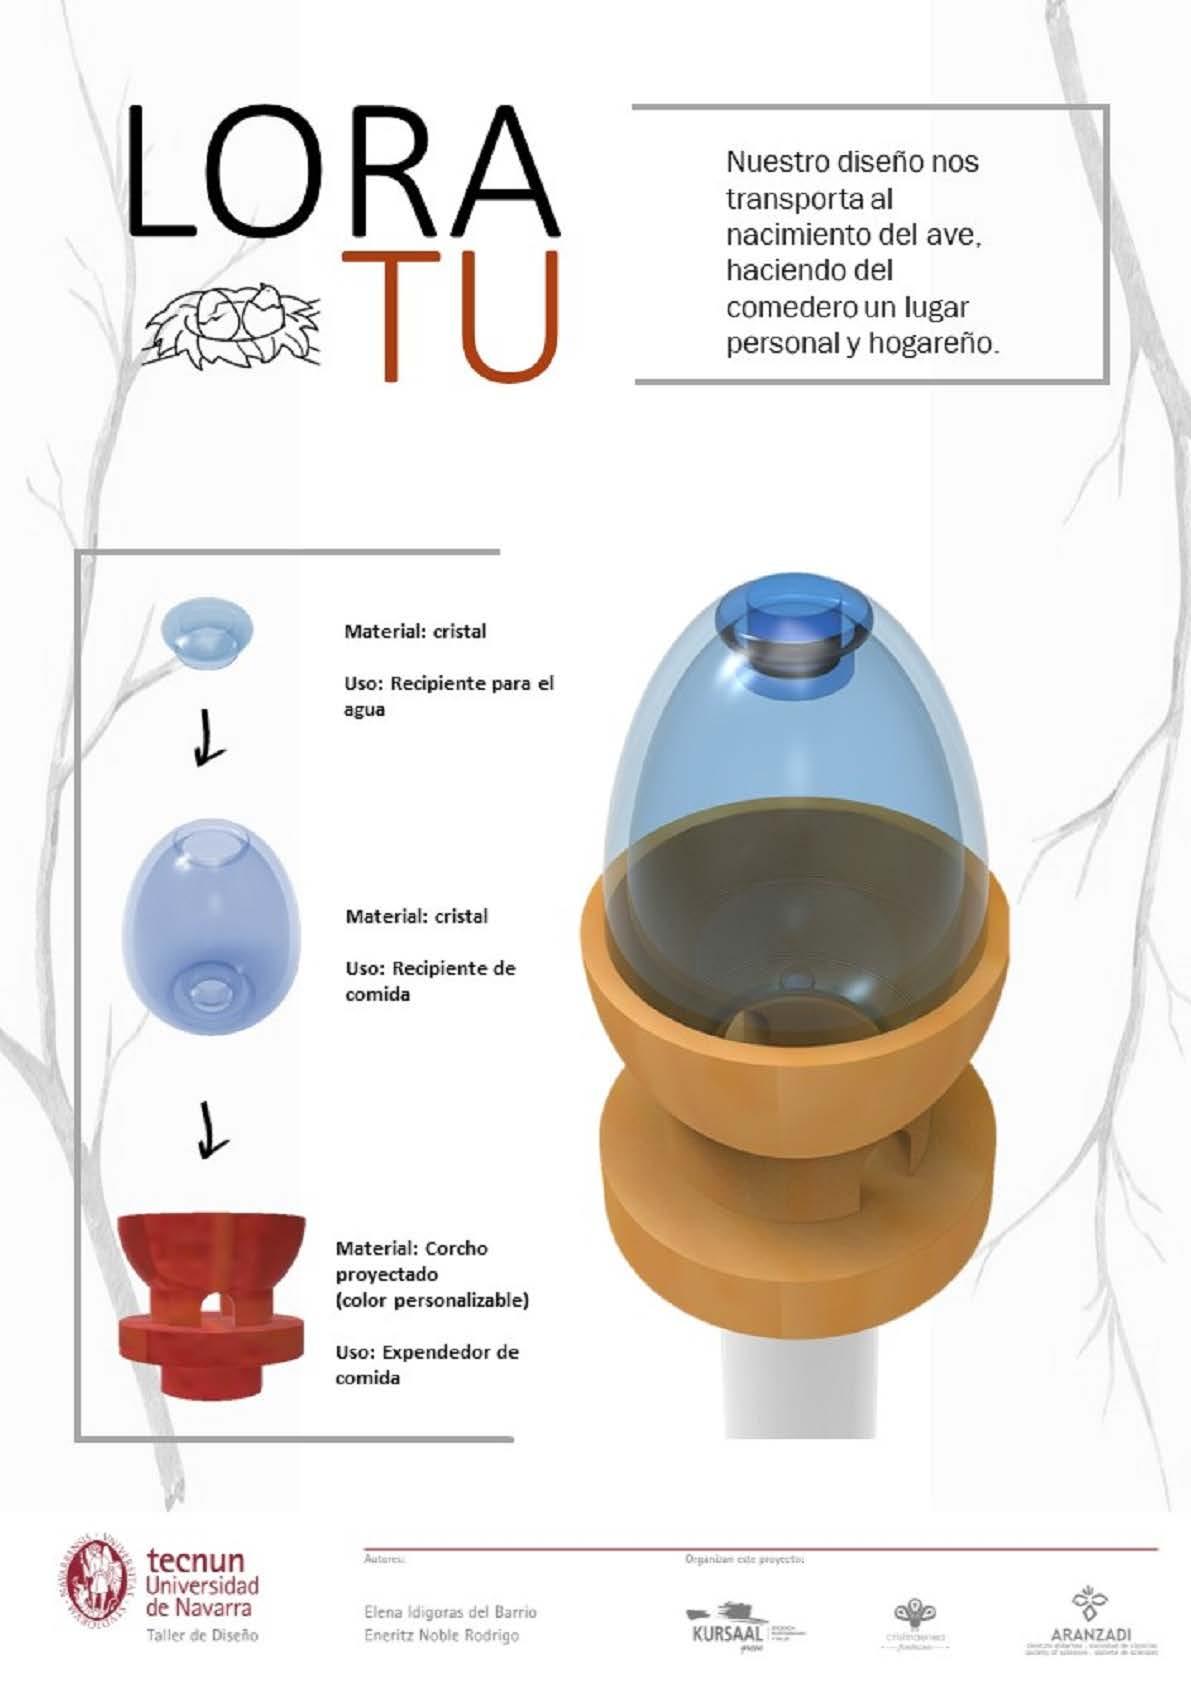 Taller de diseño - Tecnum - Txoriak - LORATU